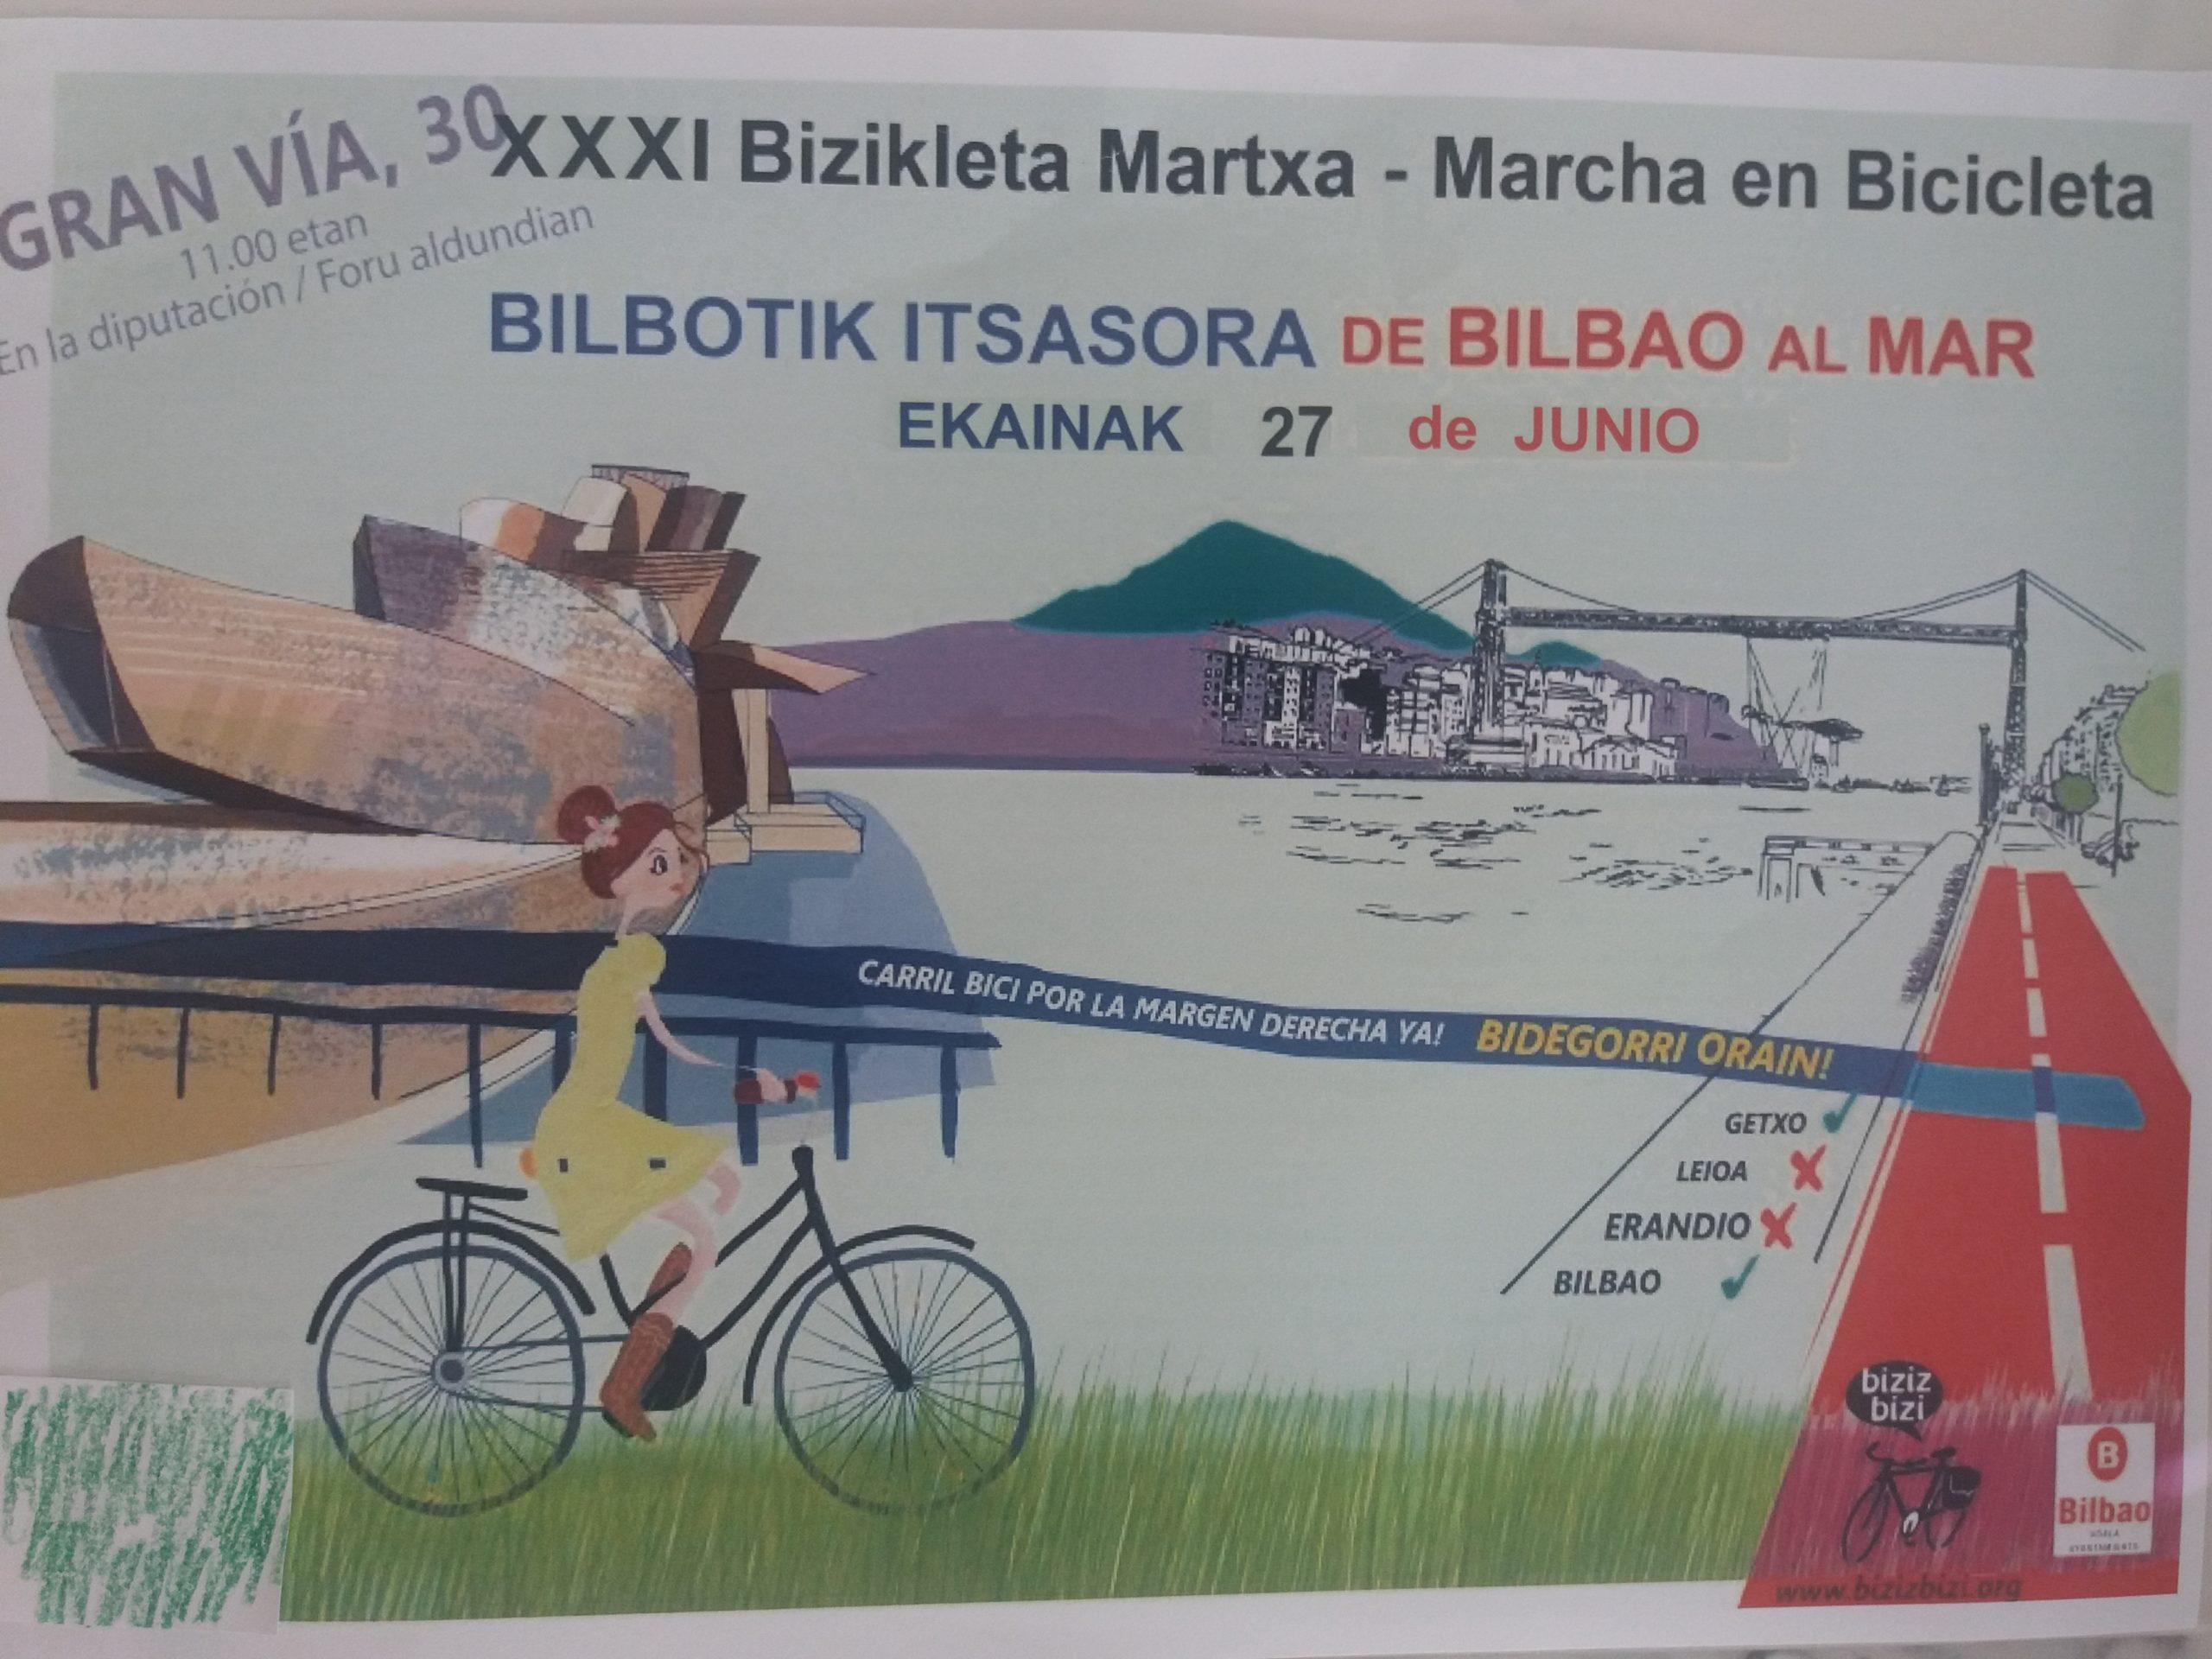 XXXI Bicimarcha Bilbotik Itsasora